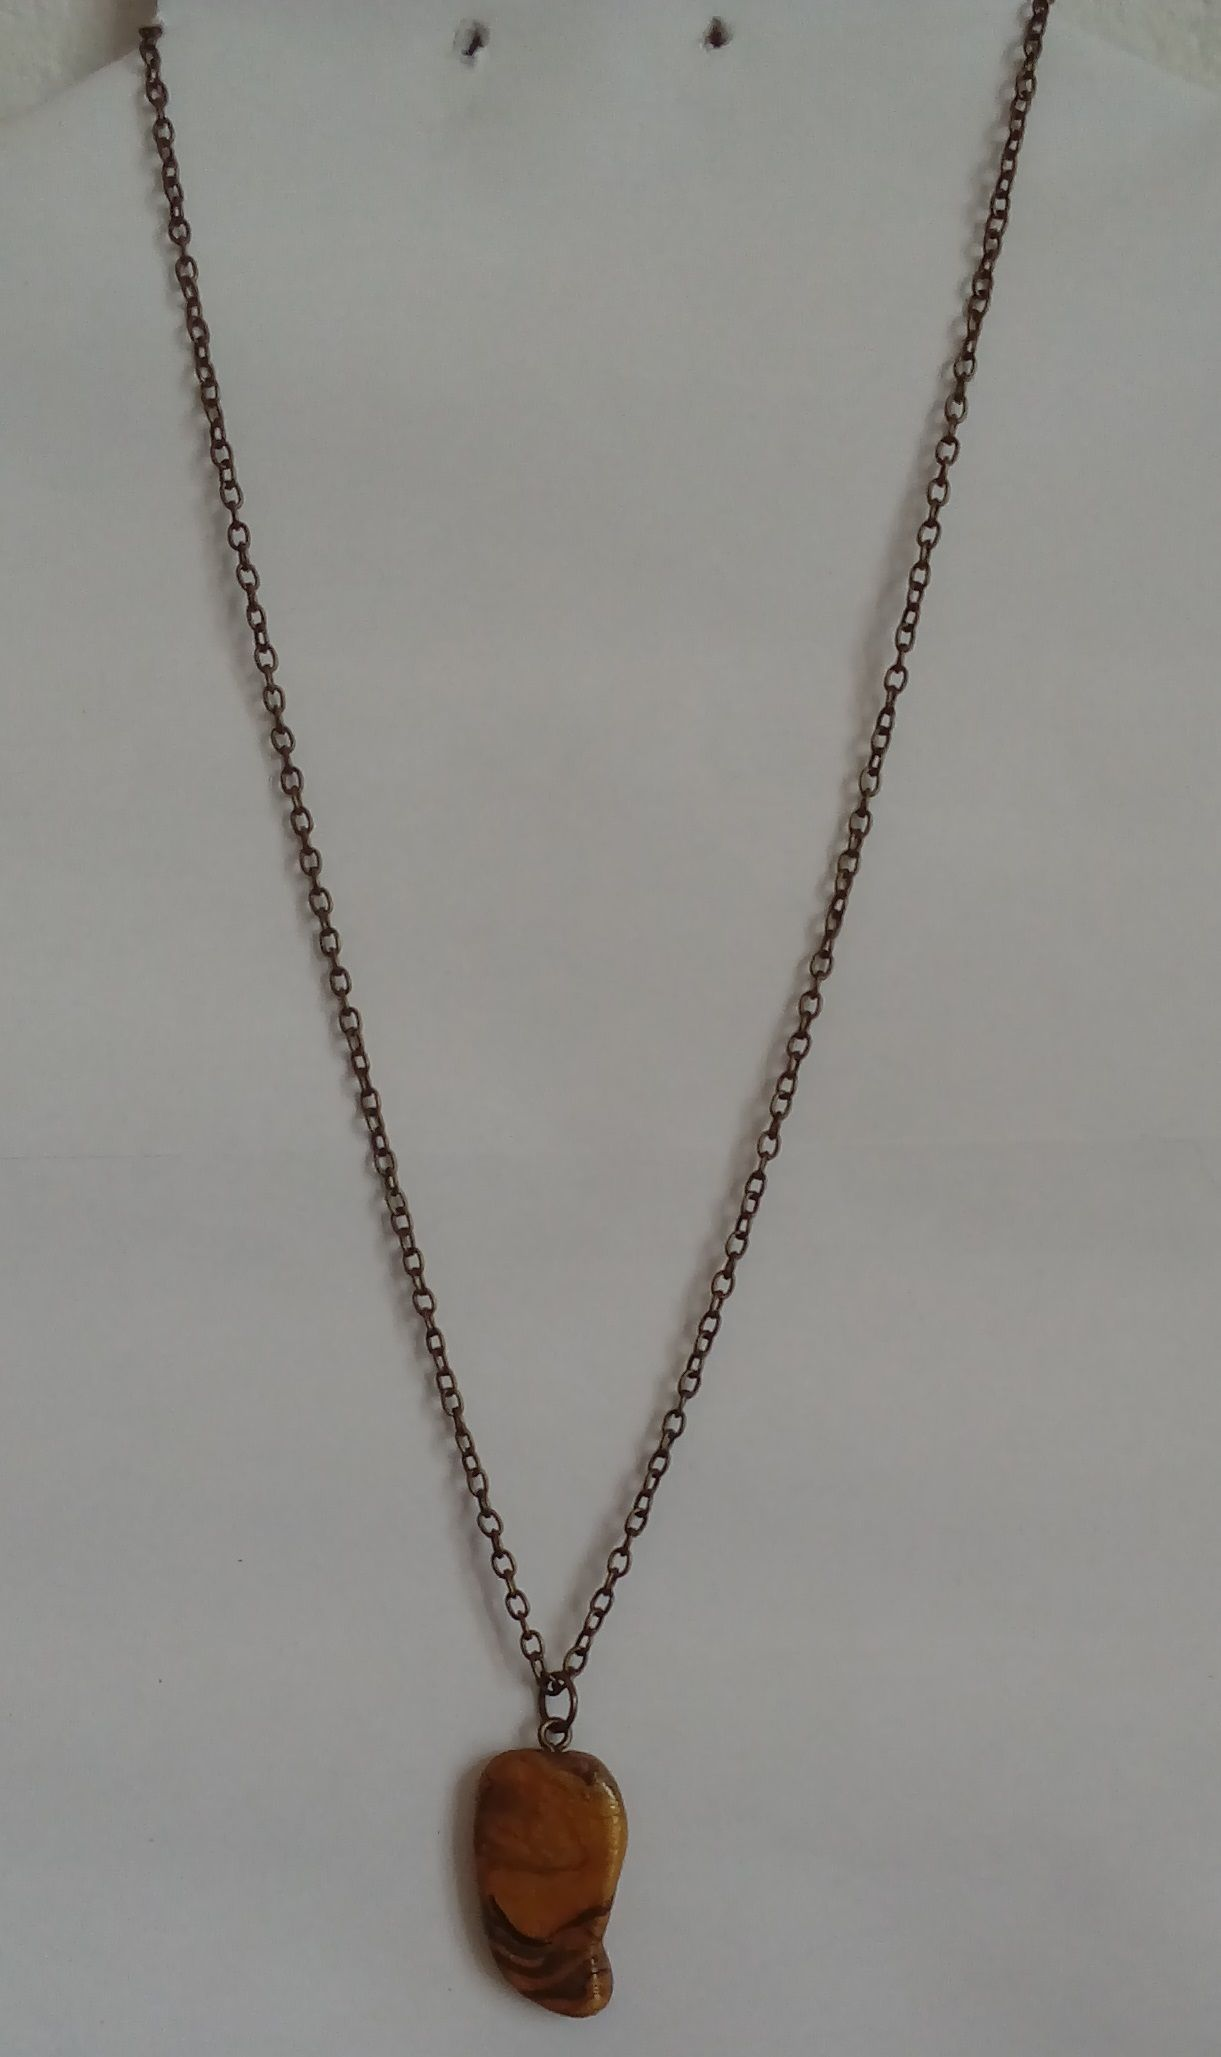 Halskette uepepita de orouc halsschmuck paolaus kollektion